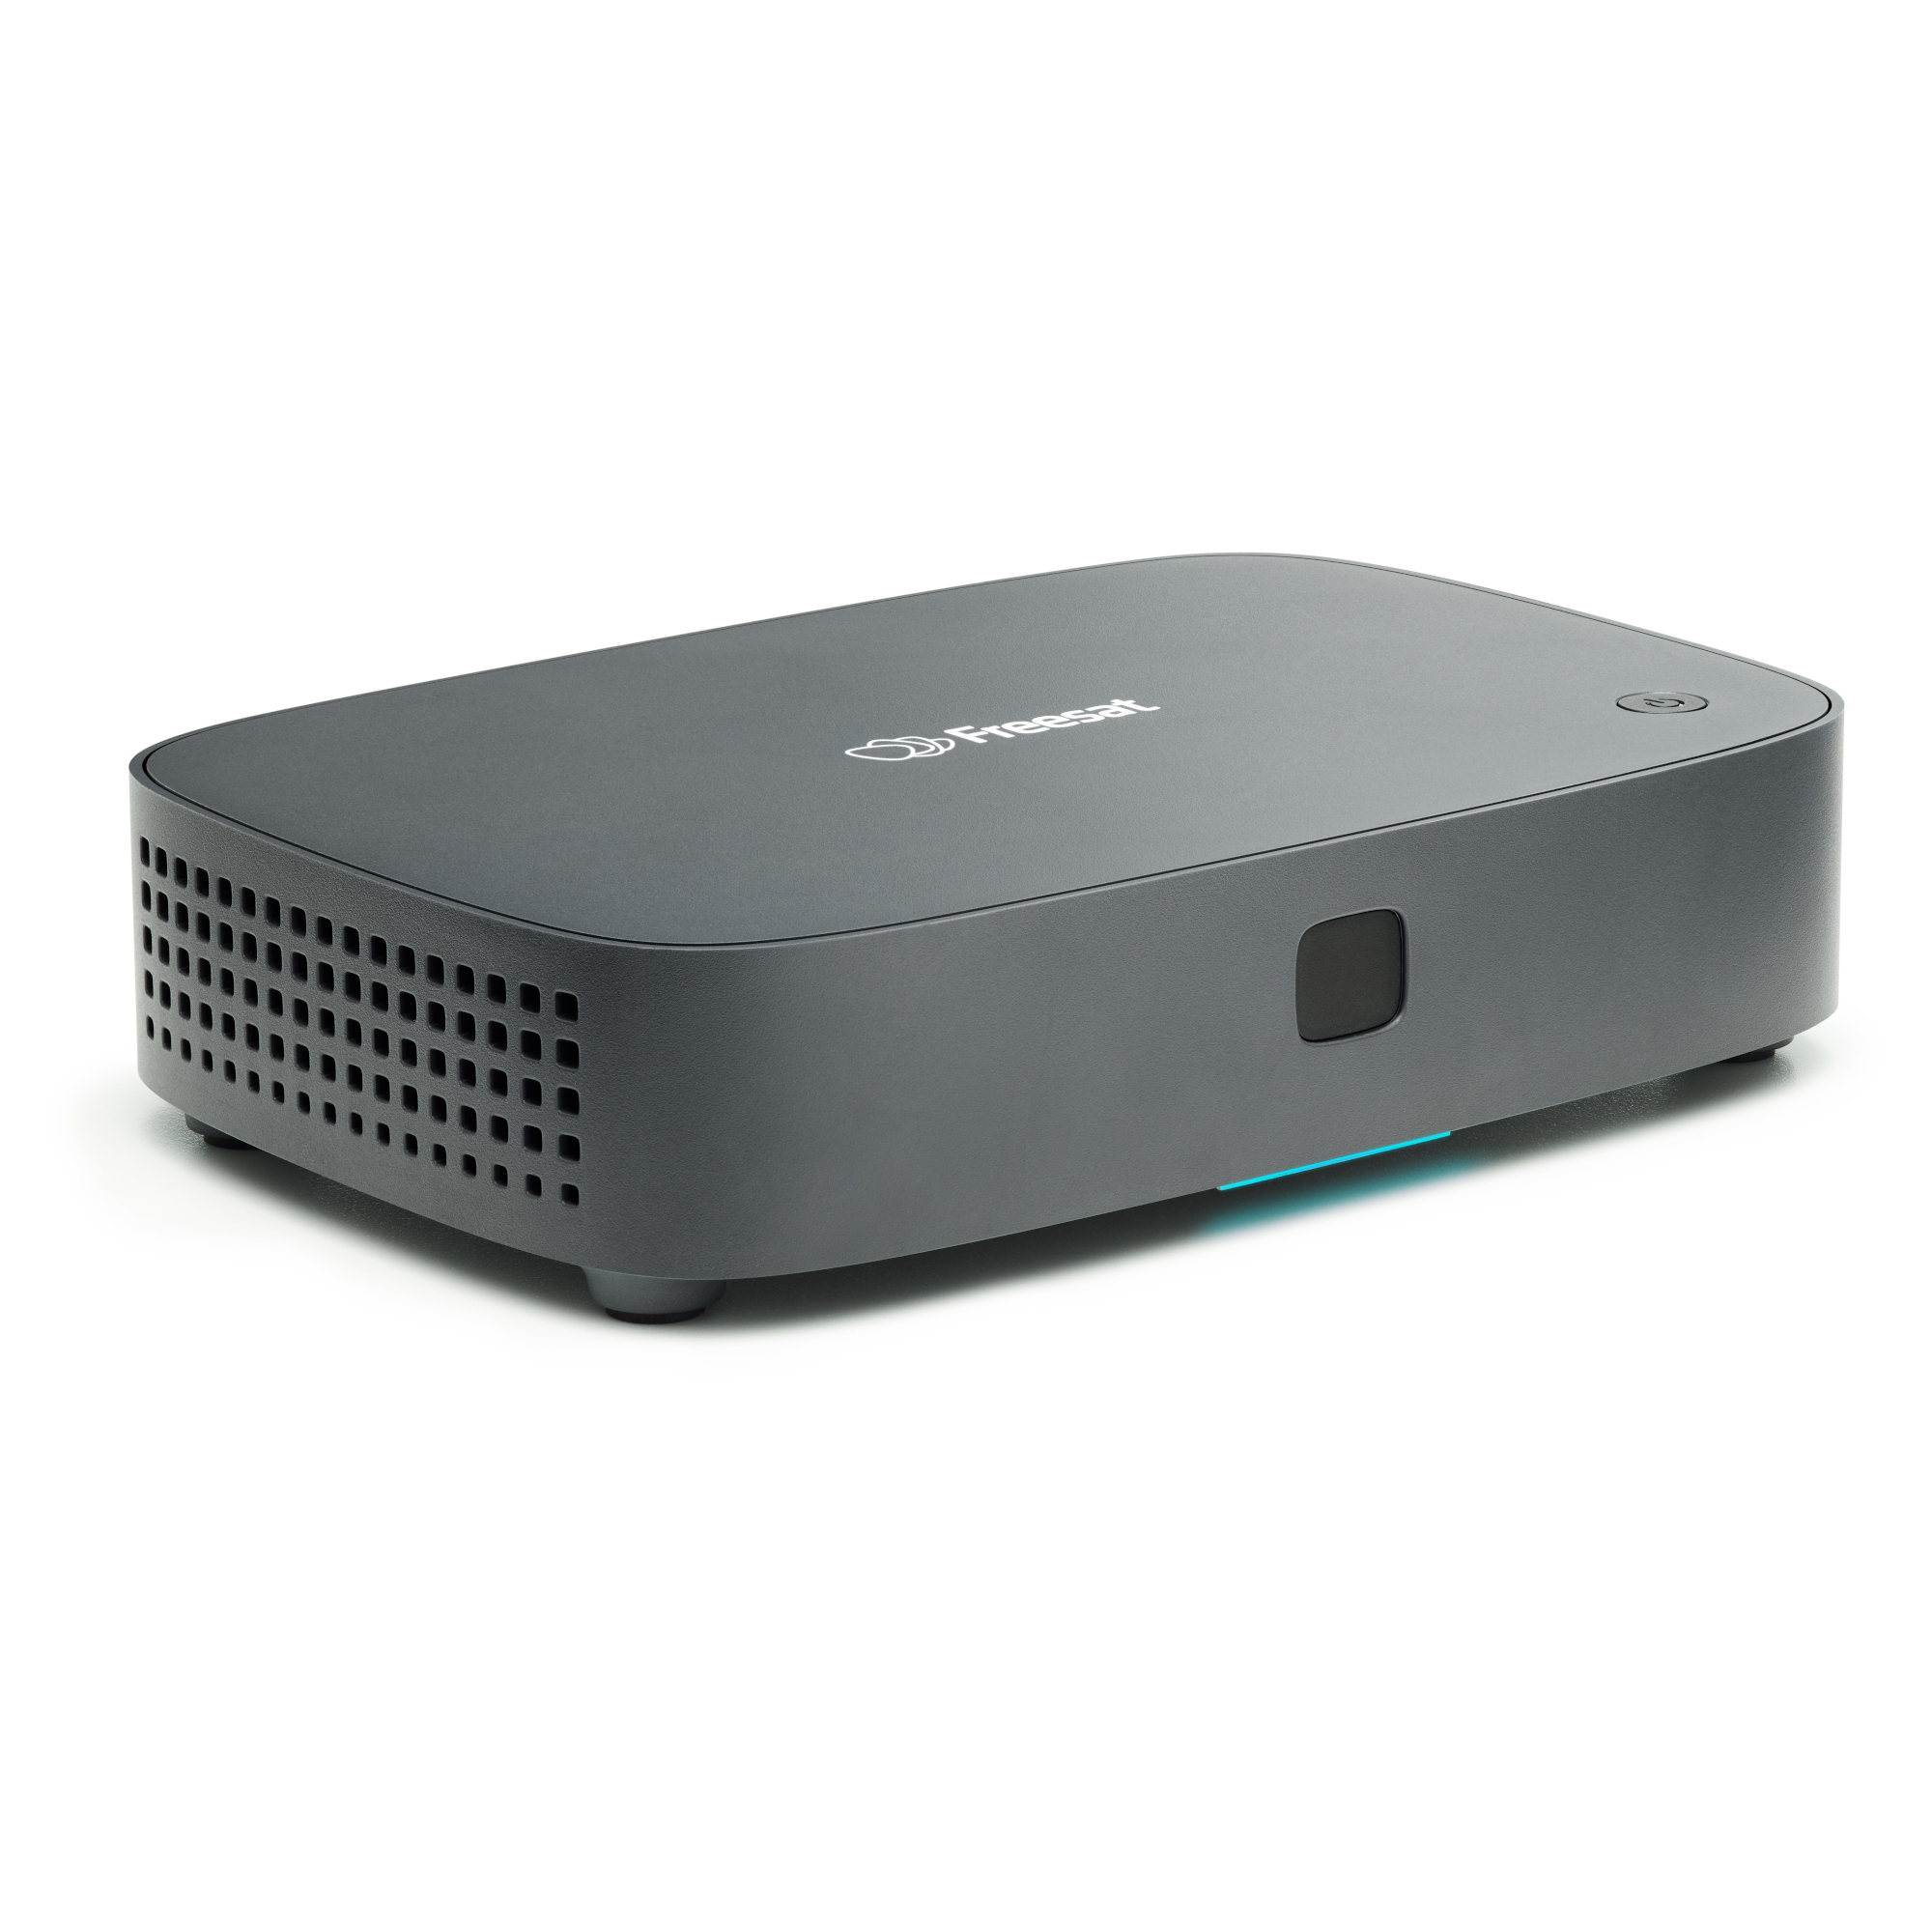 Freesat Zapper UHD-X 4K TV Box with Amazon Prime Video App